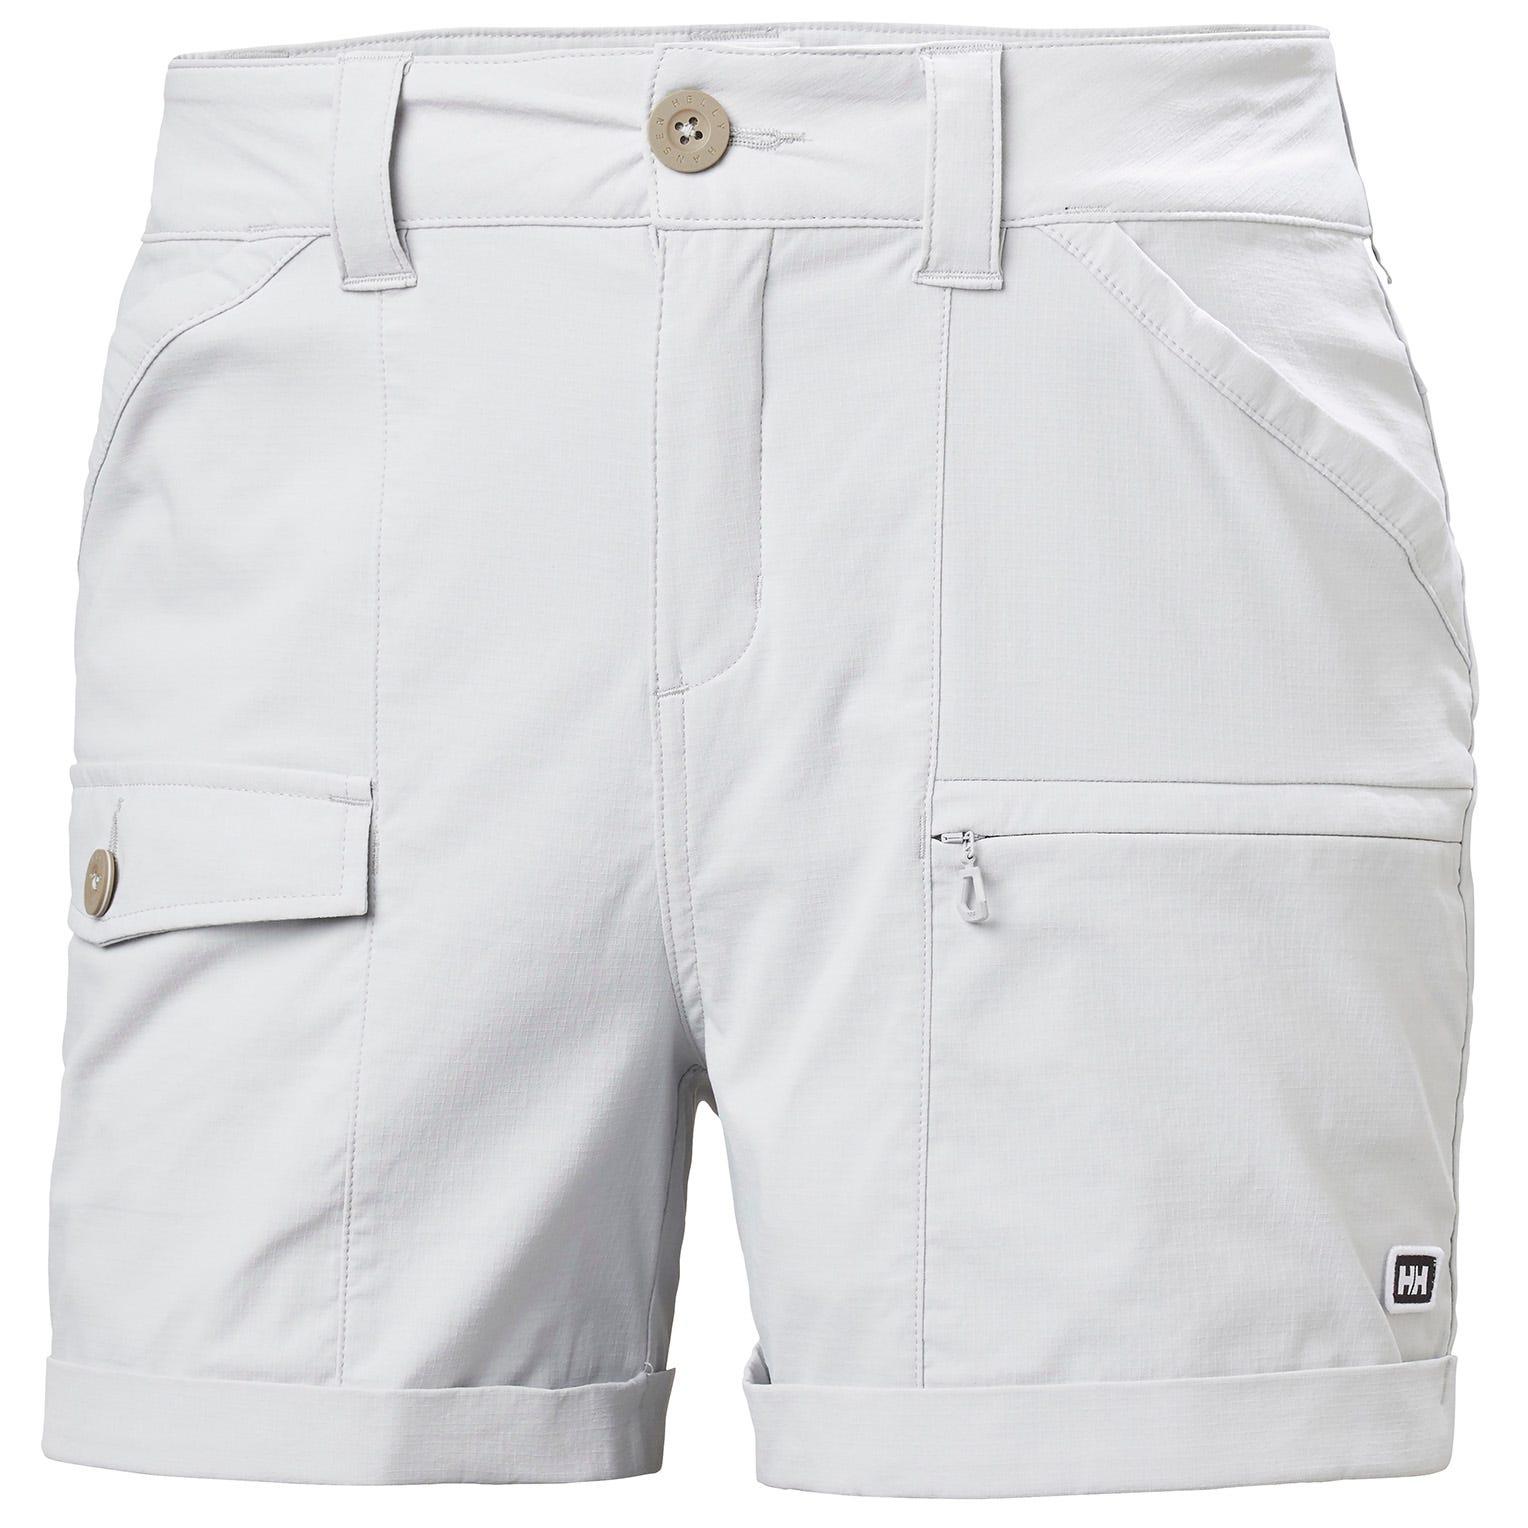 Womens Maridalen Quick Dry Cargo Shorts | Uk Helly Hansen Womens Hiking Trouser Grey L